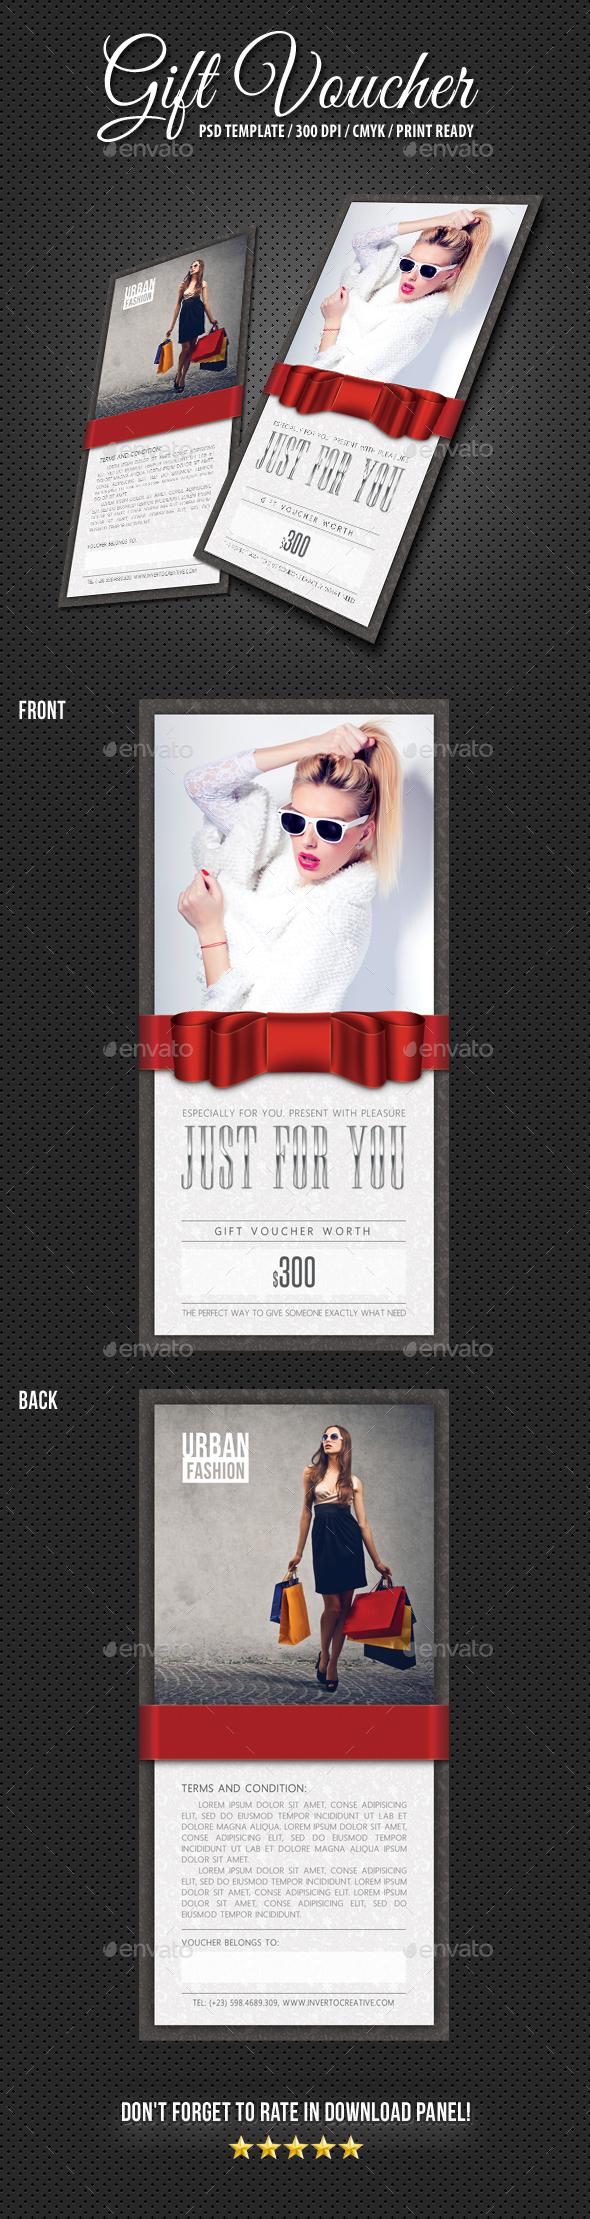 Gift Voucher Boutique - Cards & Invites Print Templates